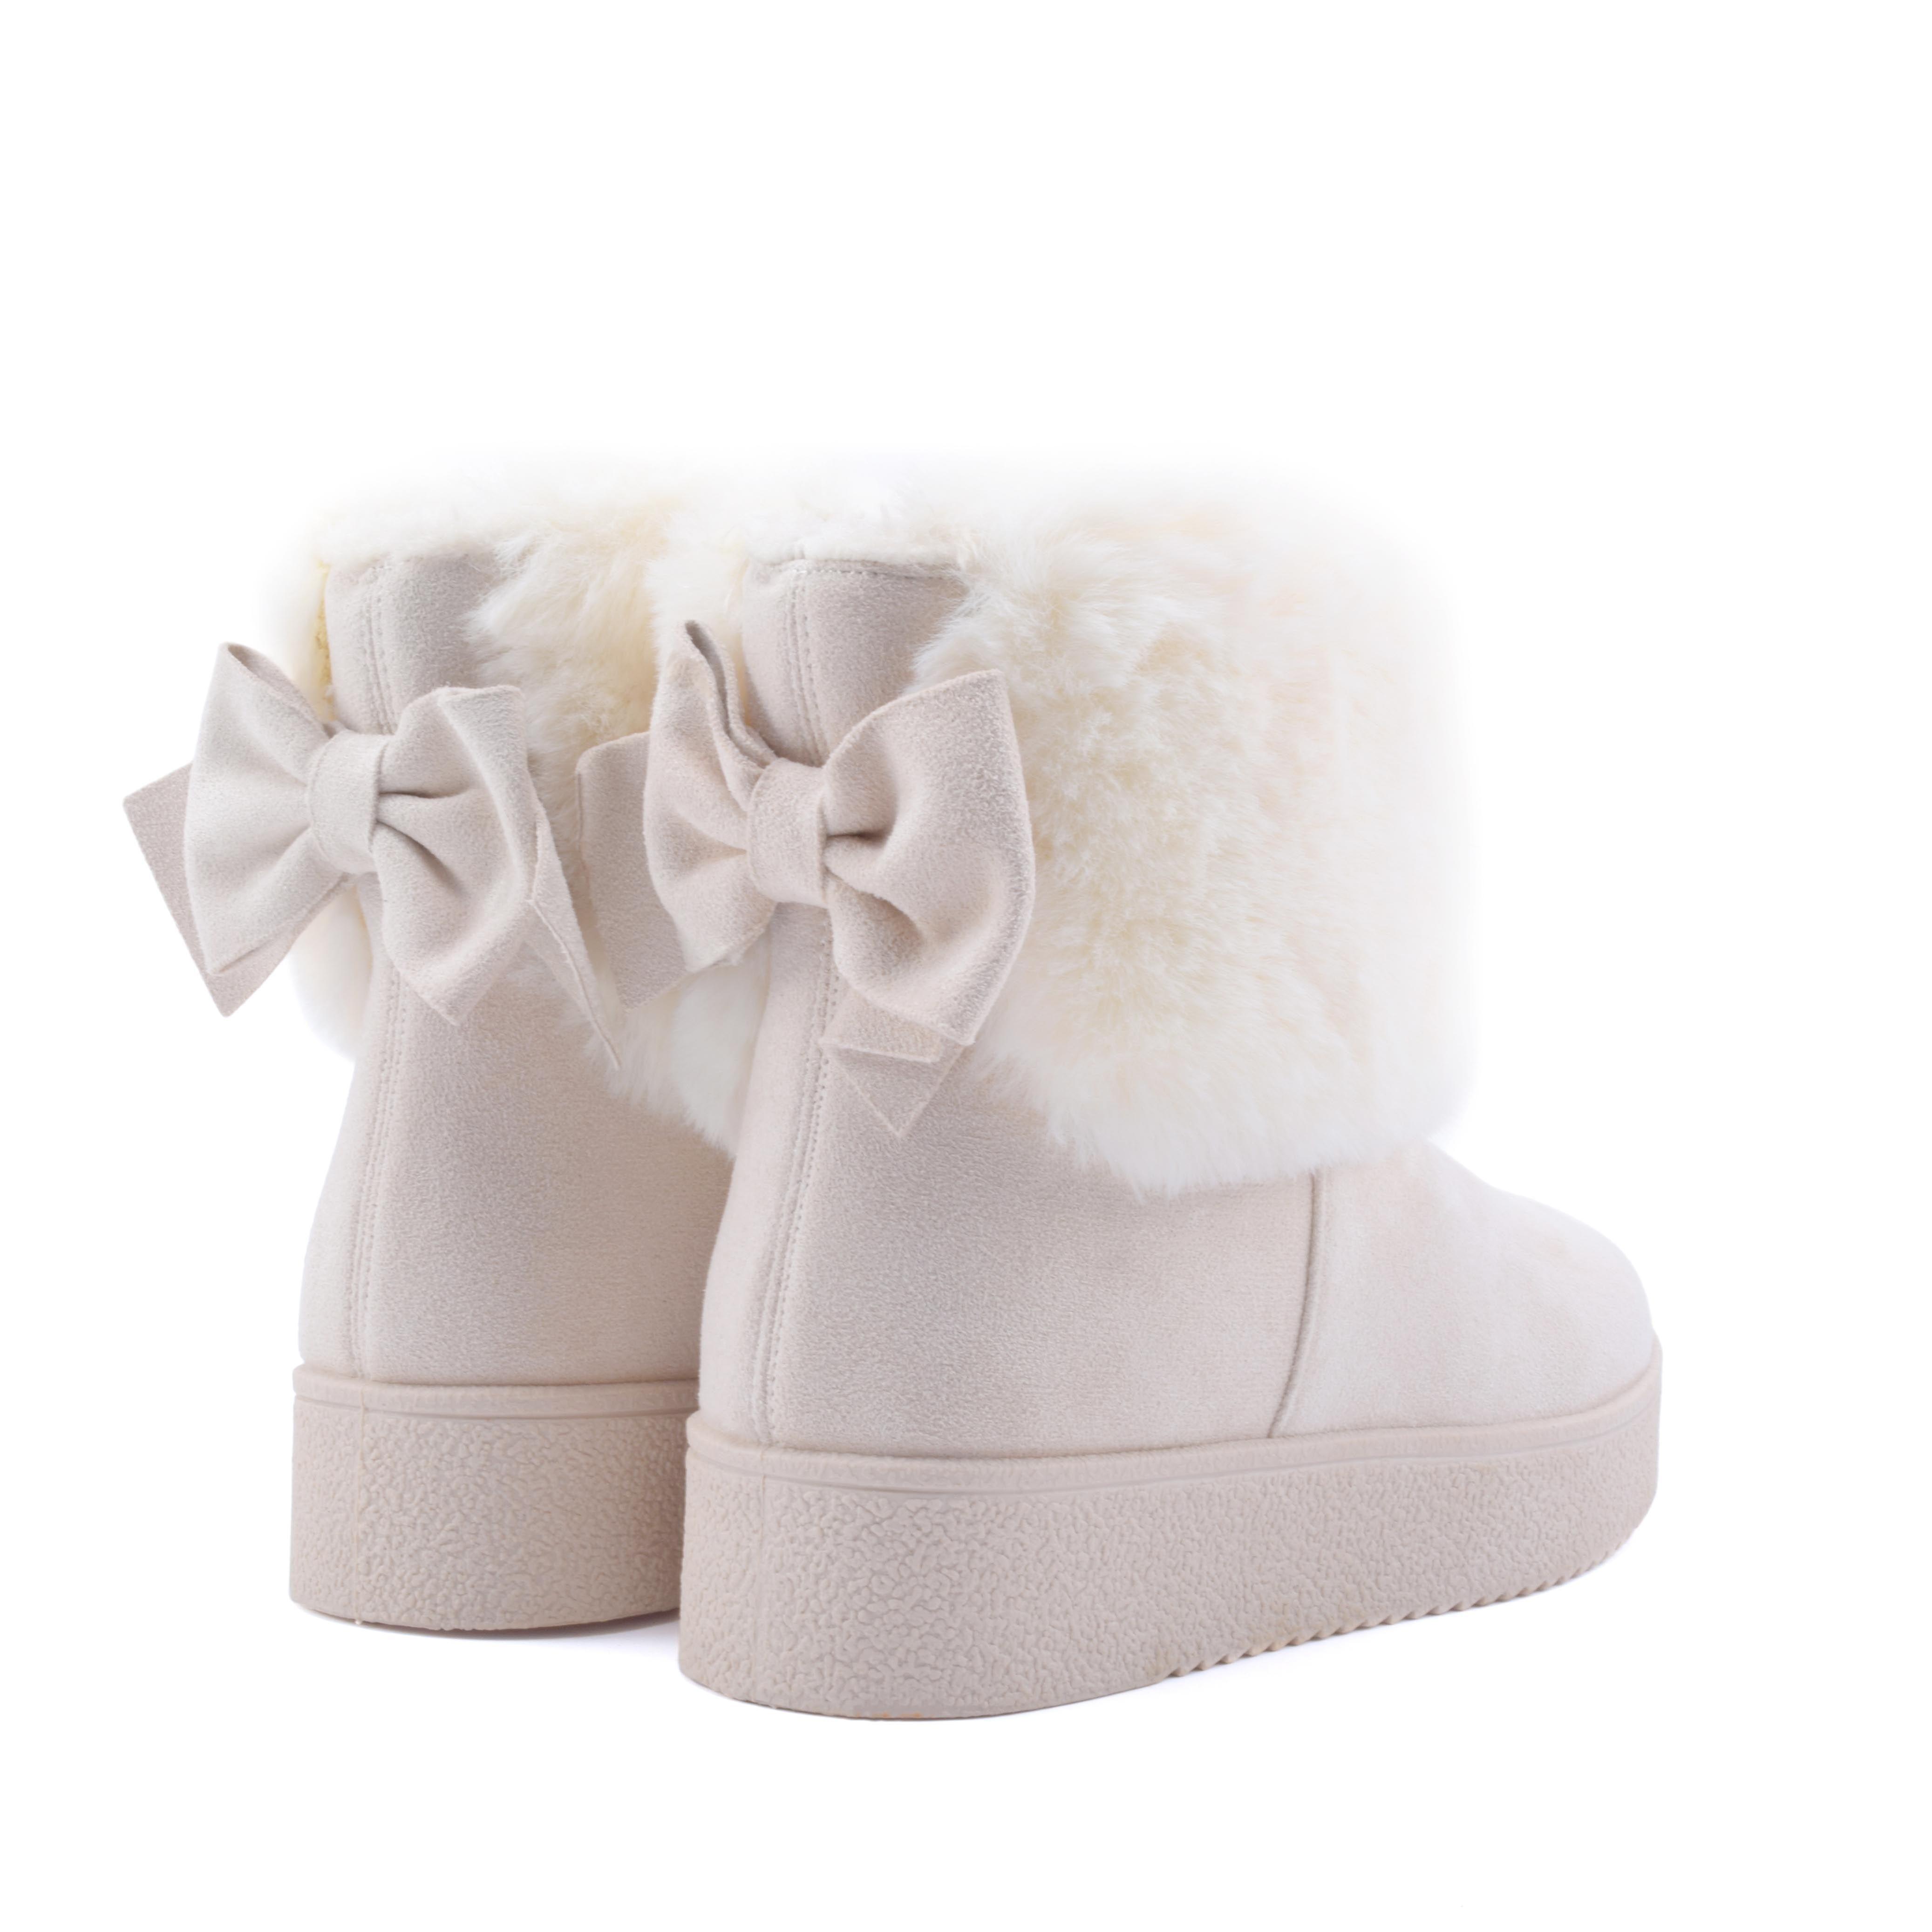 b757c47a1e Telitalpú bézs masnis hótaposó csizma - HÓTAPOSÓK - Női cipő ...